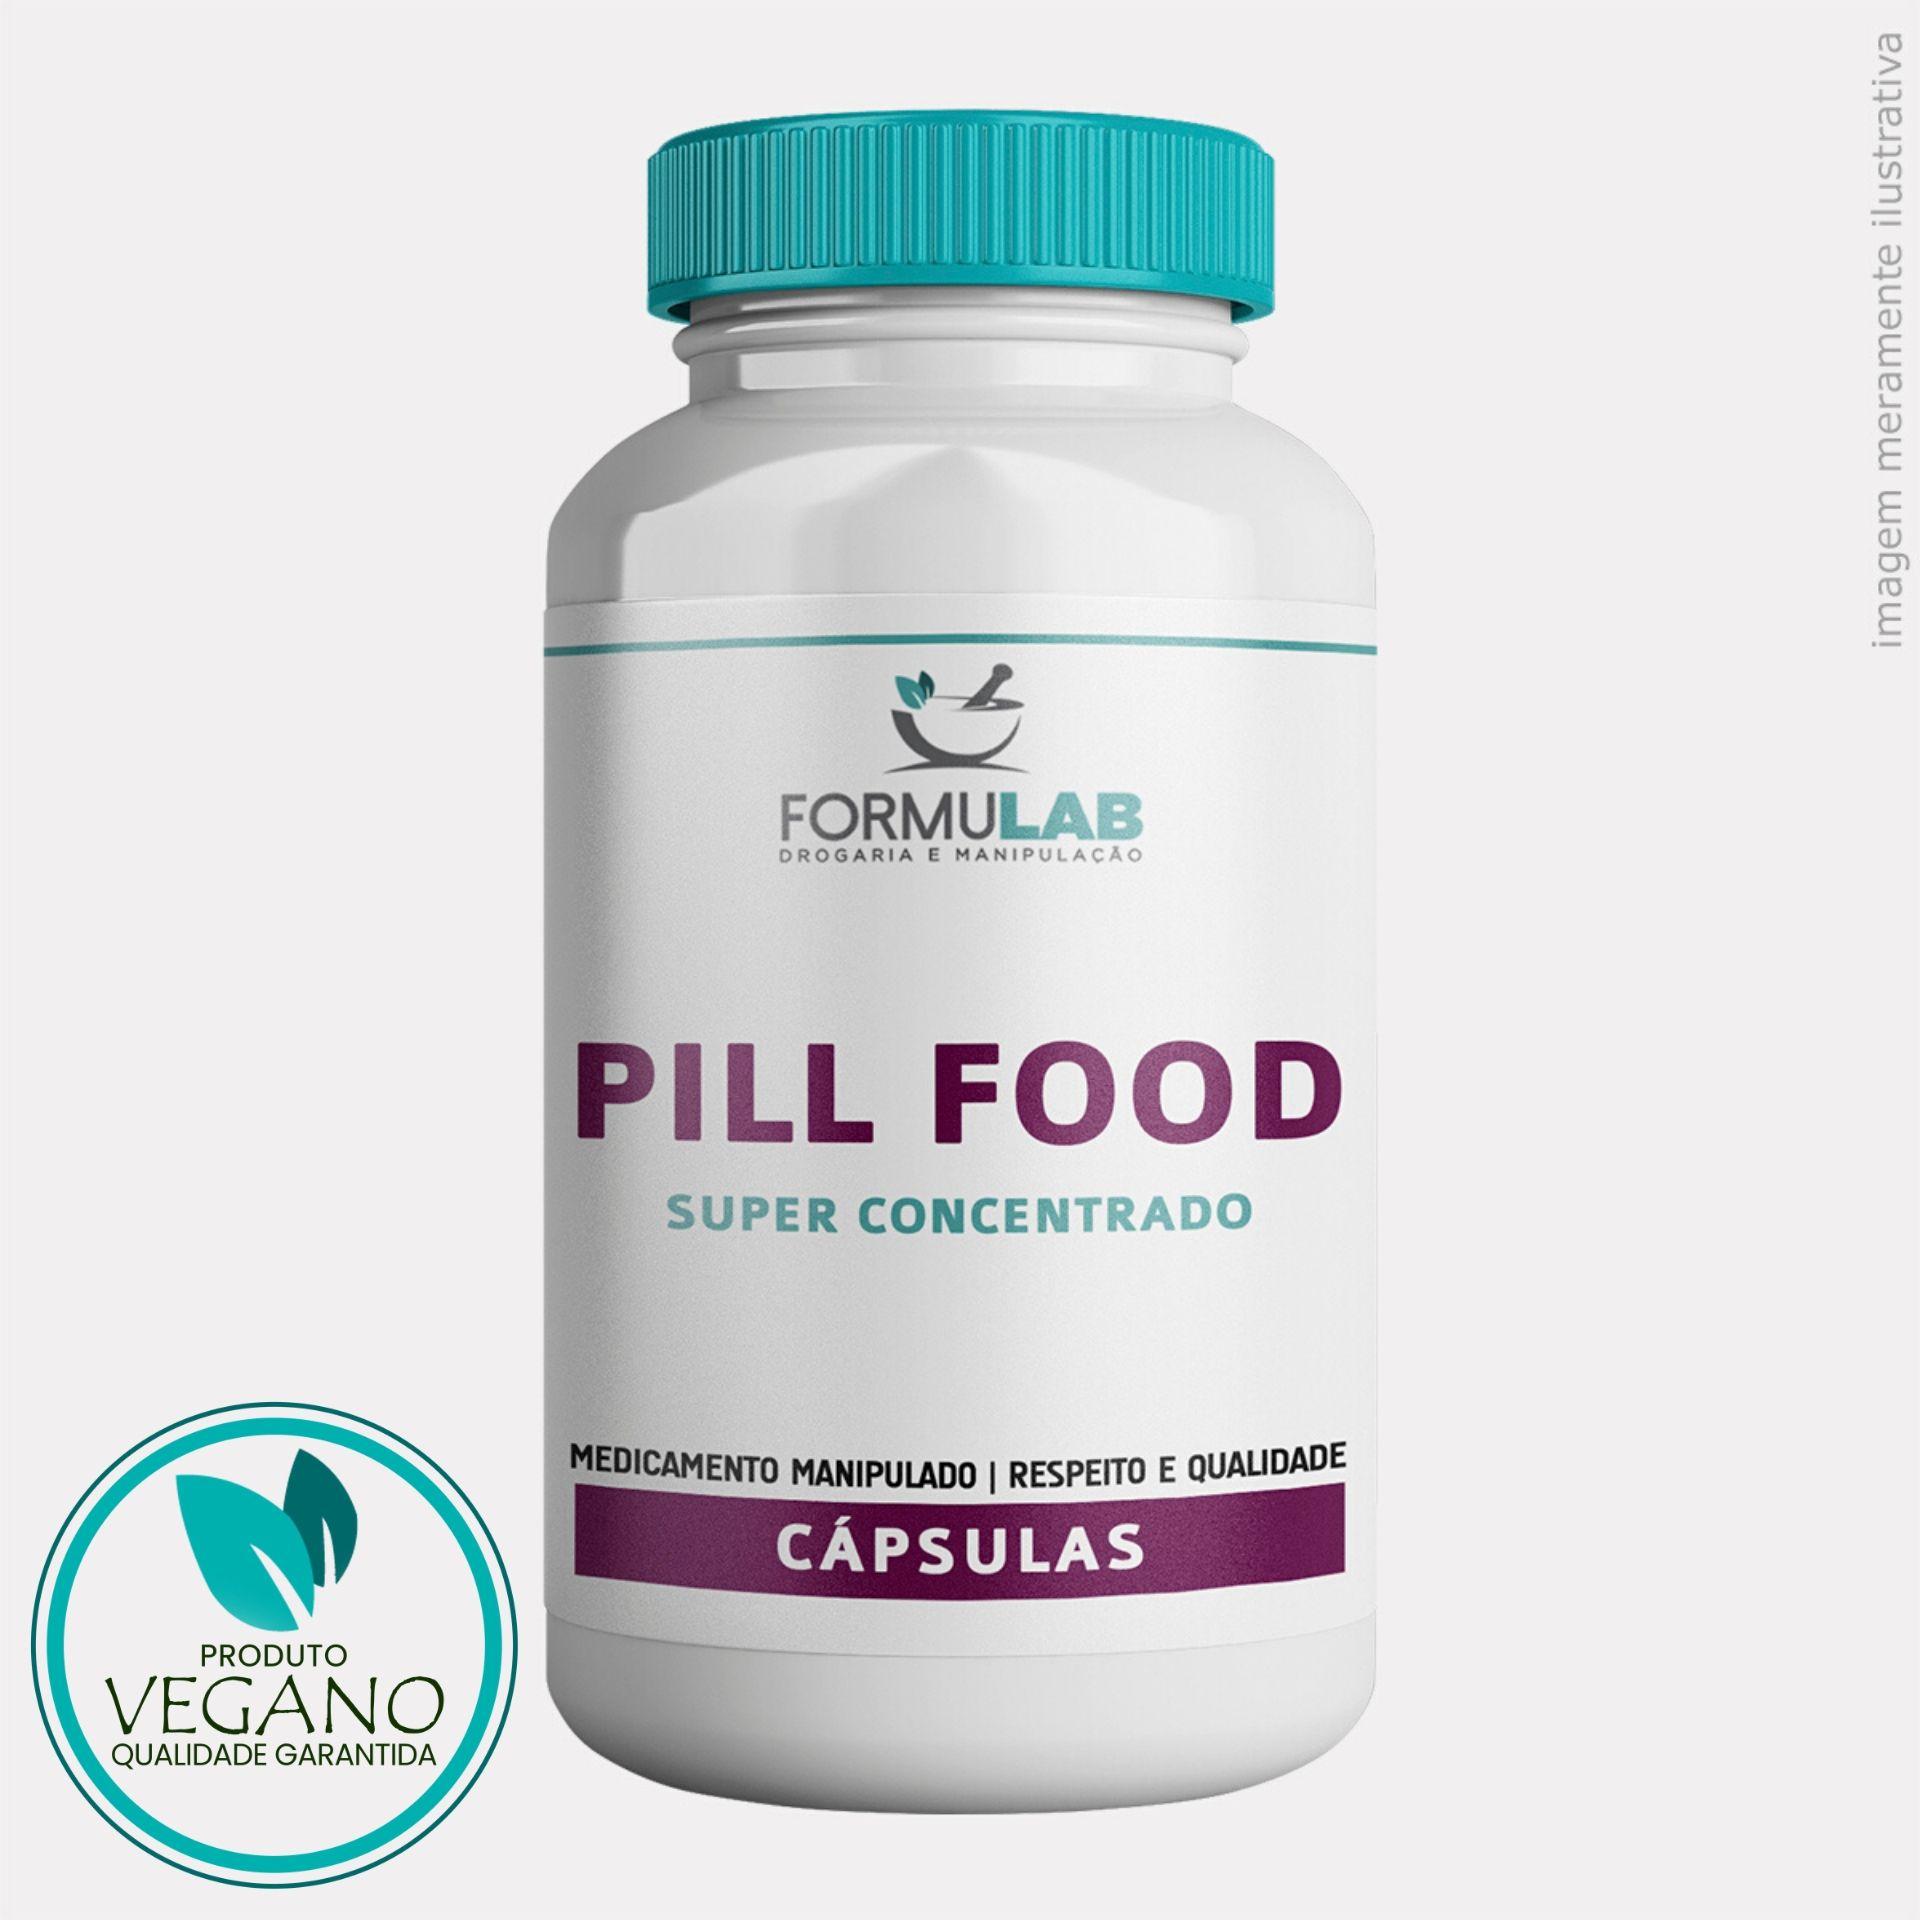 Pill Food Turbinado VEGAN - Biotina + Cisteína + Cistina + Metionina + Pantotenato de Cálcio + Vitamina B2 + Vitamina B6 + Vitamina E + Vitamina A + Silicio + MSM